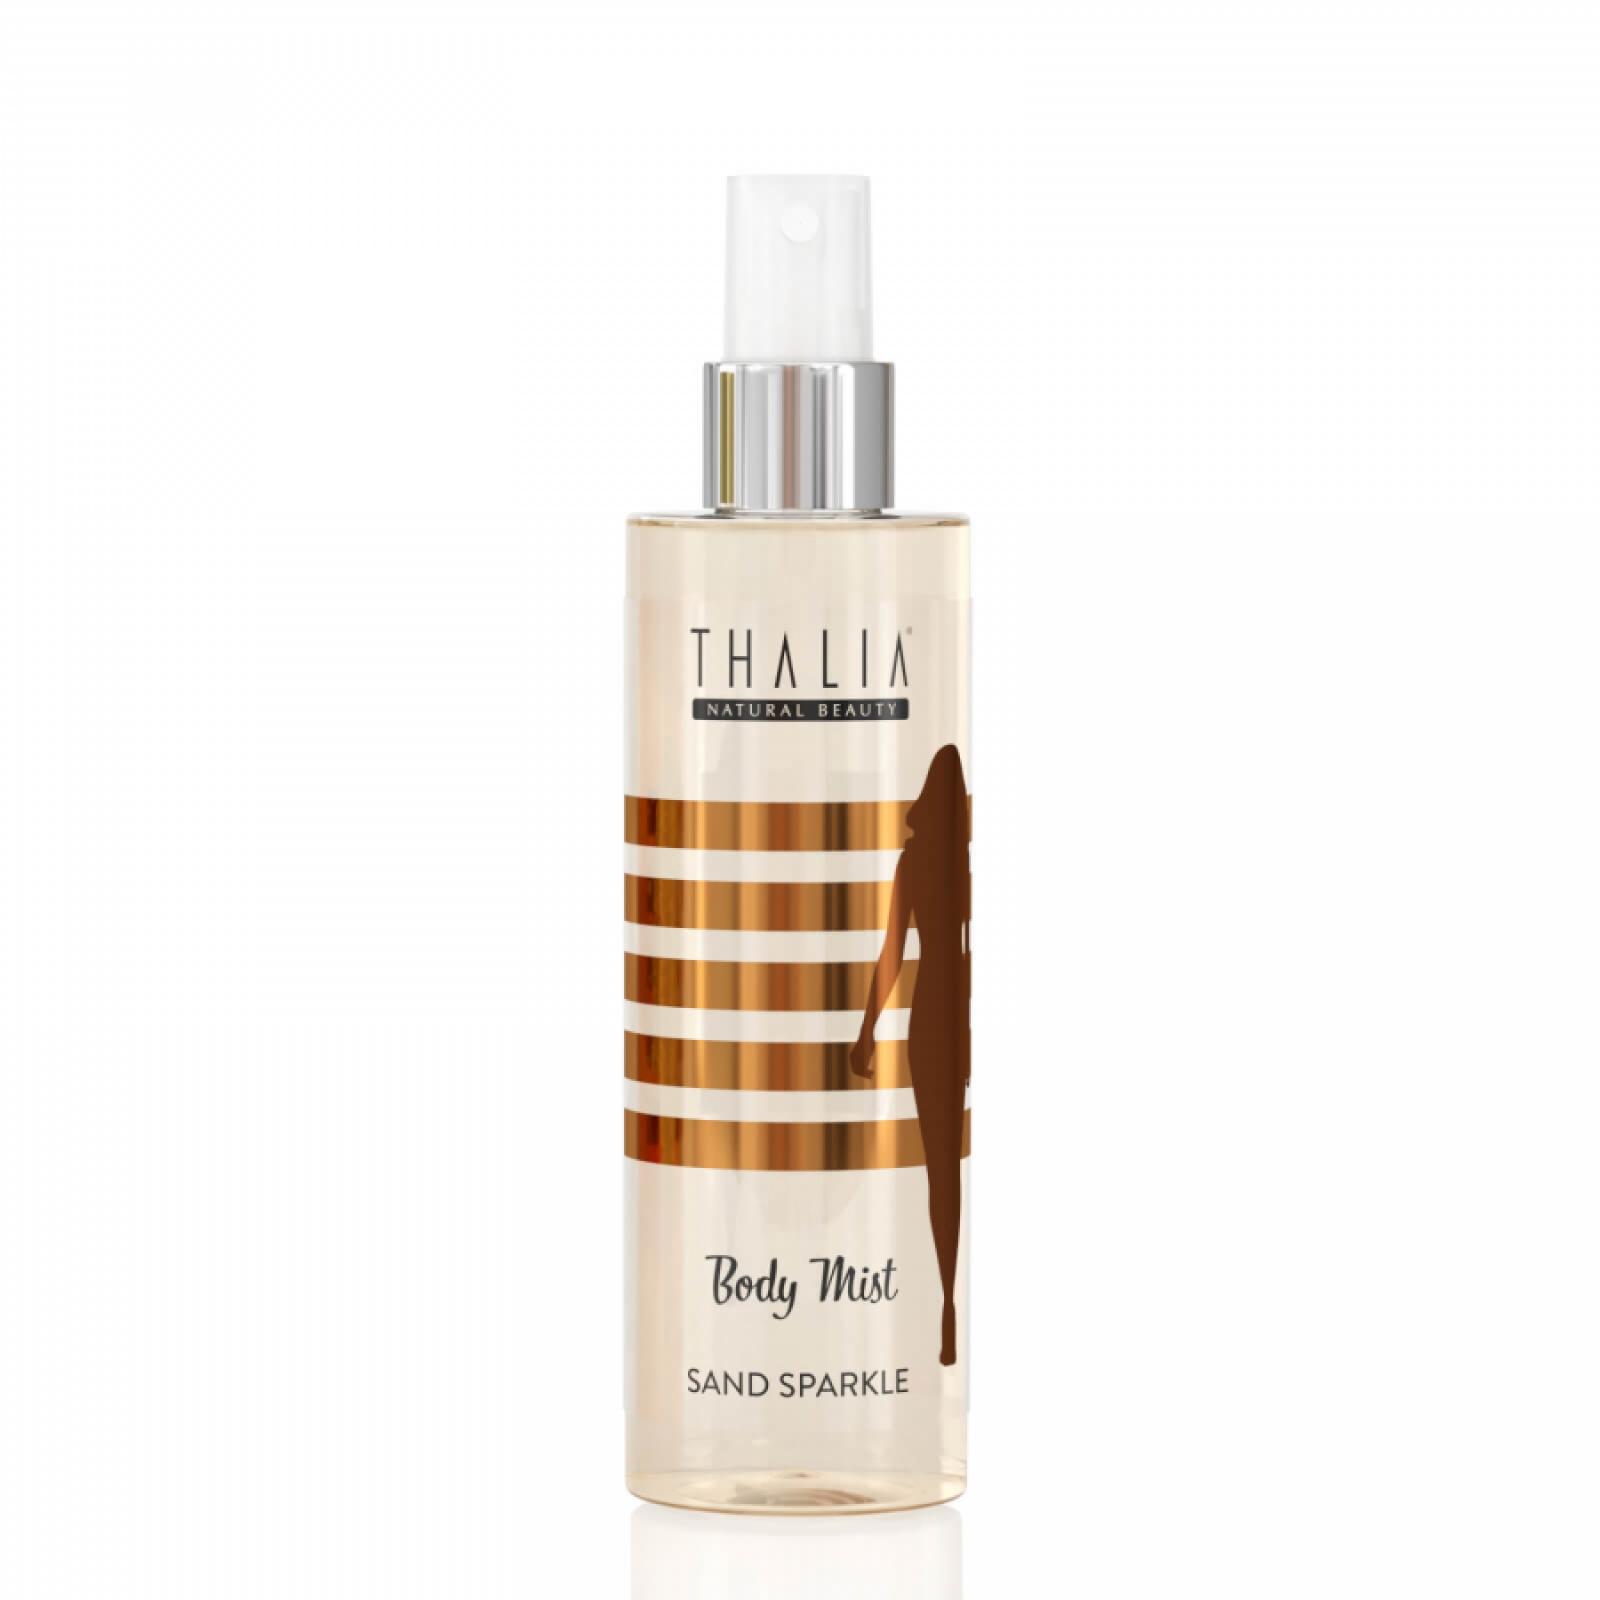 Thalia Sand Sparkle Body Mist 200 ml